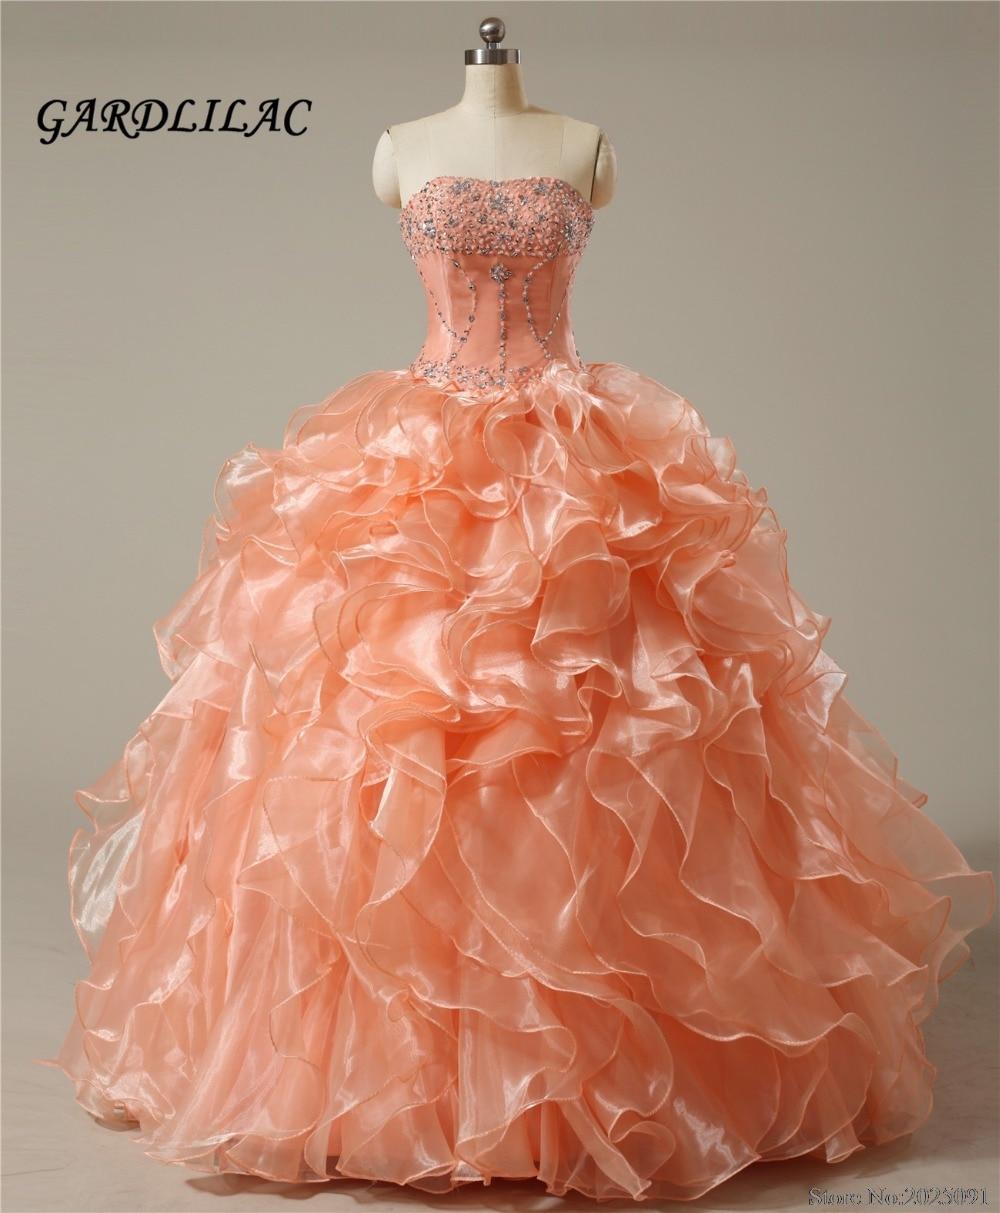 Strapless Coral Quinceanera kleidid 2019 Ball kleit Crystal helmedega Odavad Quinceanera hommikumantlid Long Prom kleit